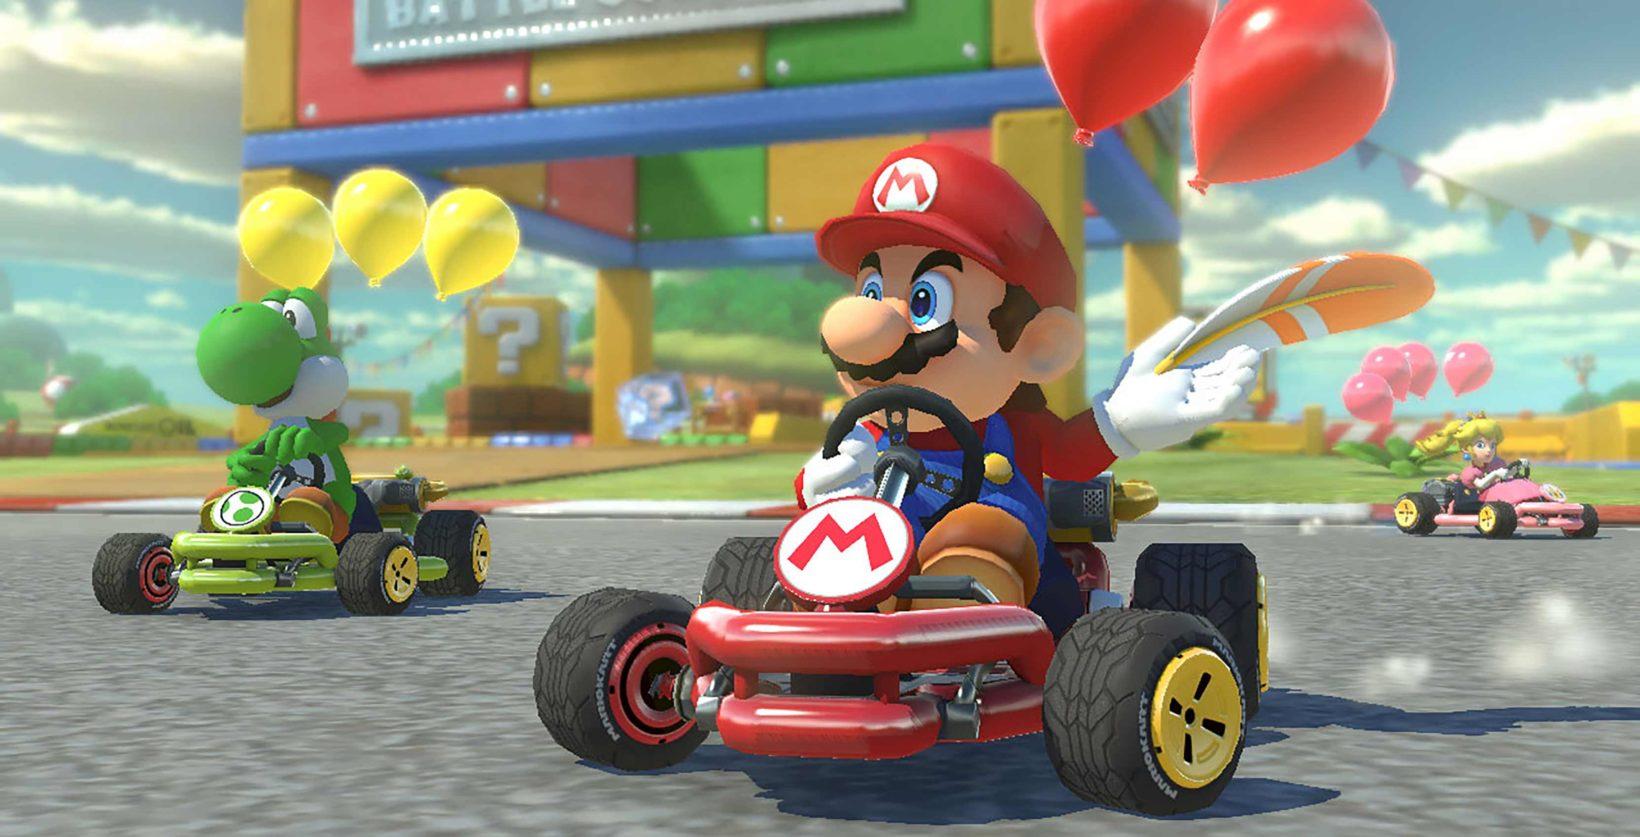 Ring-Con, periferica fan-made per Mario Kart 8 DX